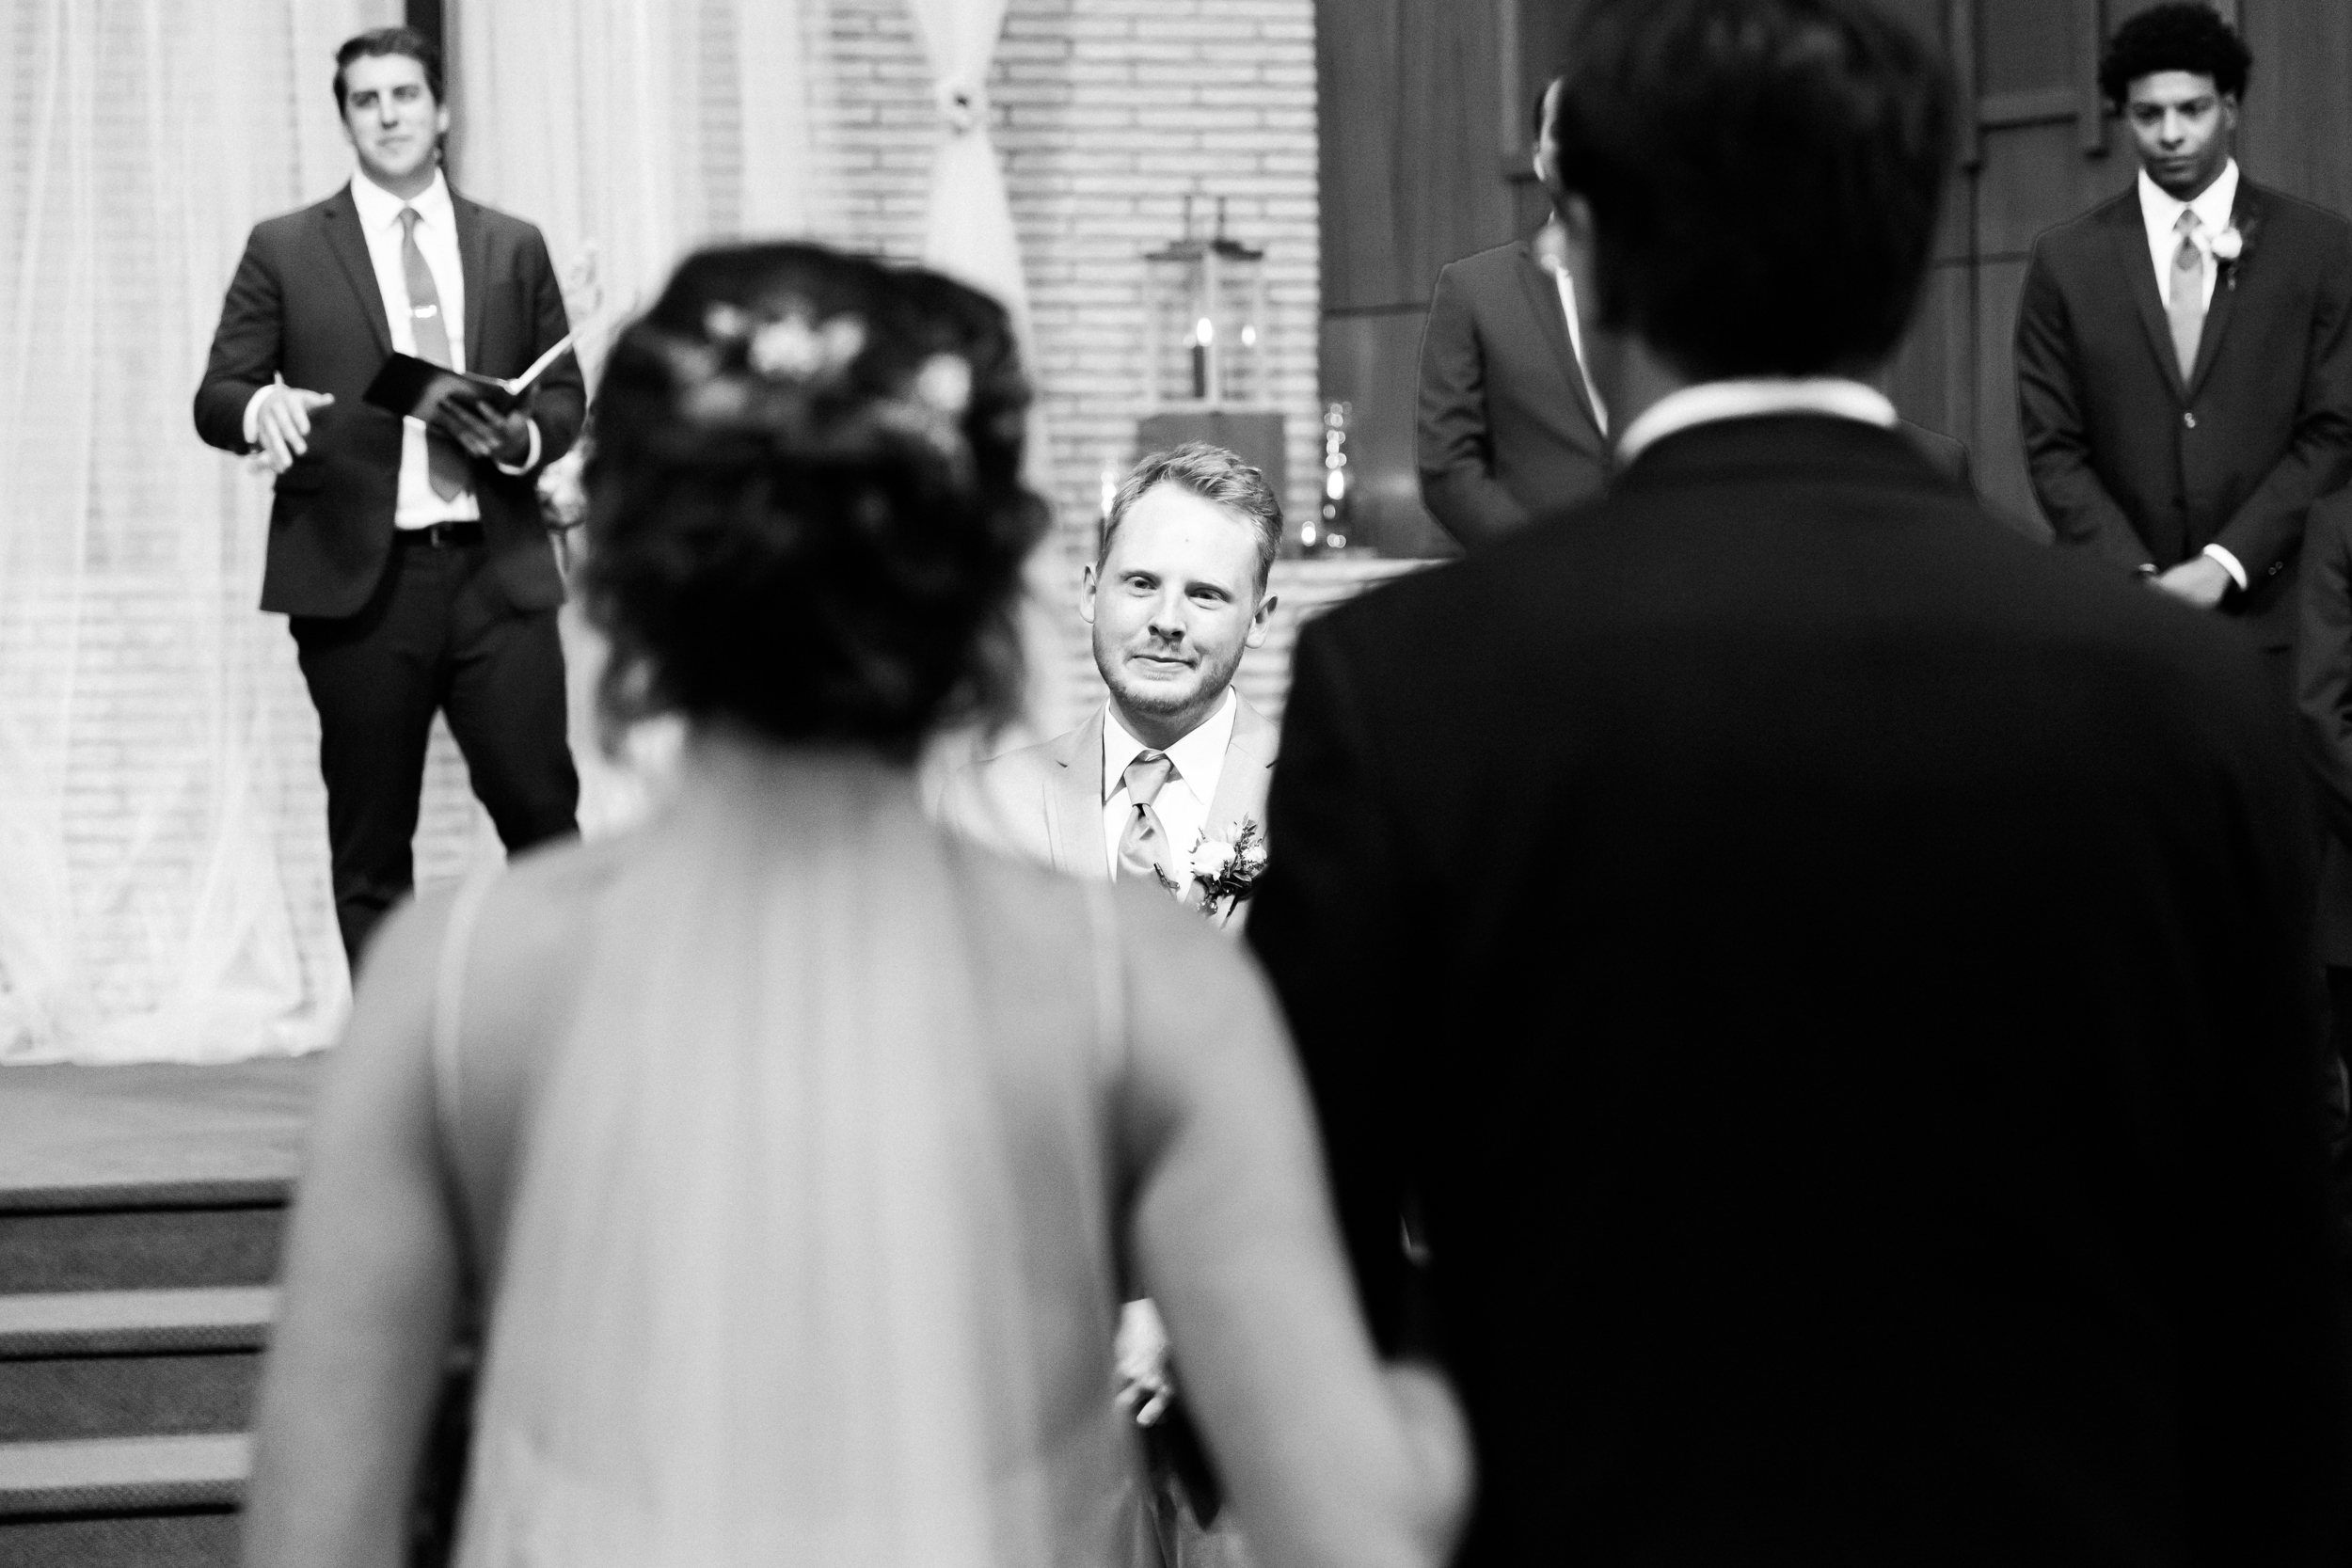 calebclairewedding-44.jpg